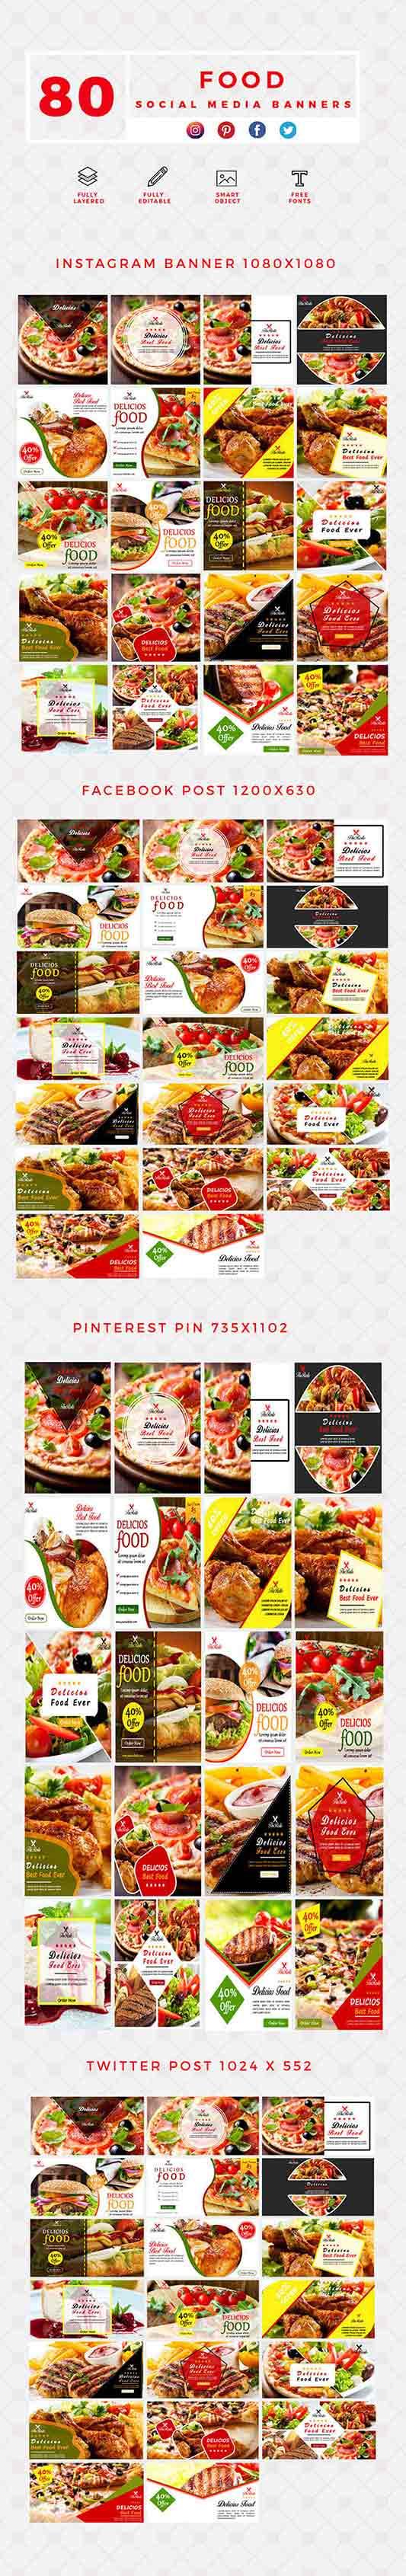 300+Social Media Banner Templates - Food